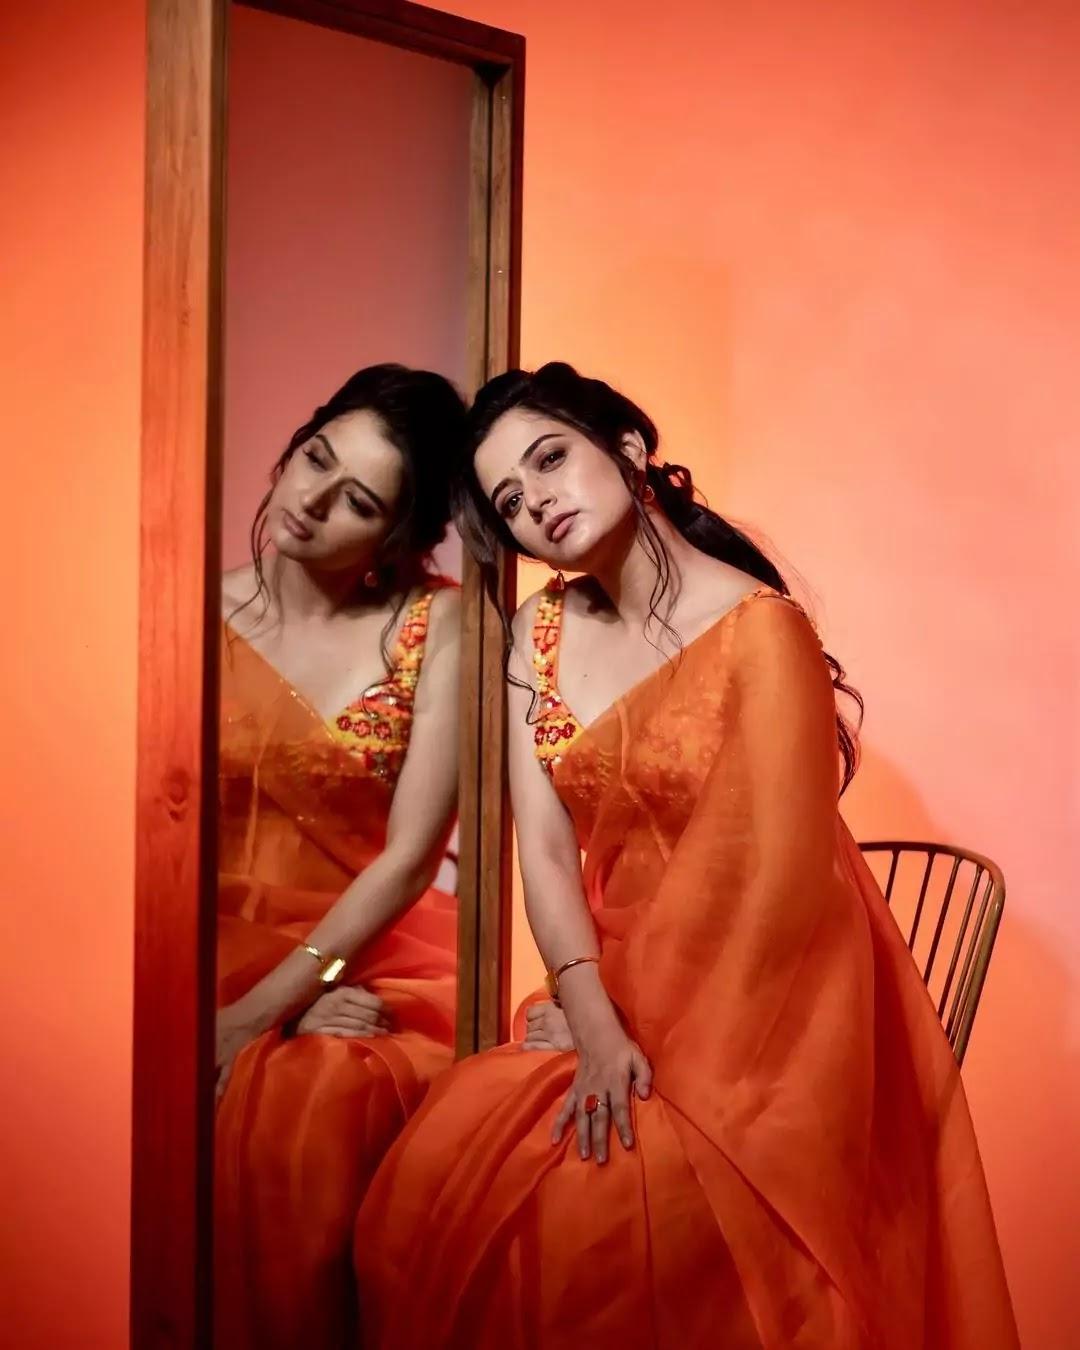 ashika-ranganath-in-orange-saree